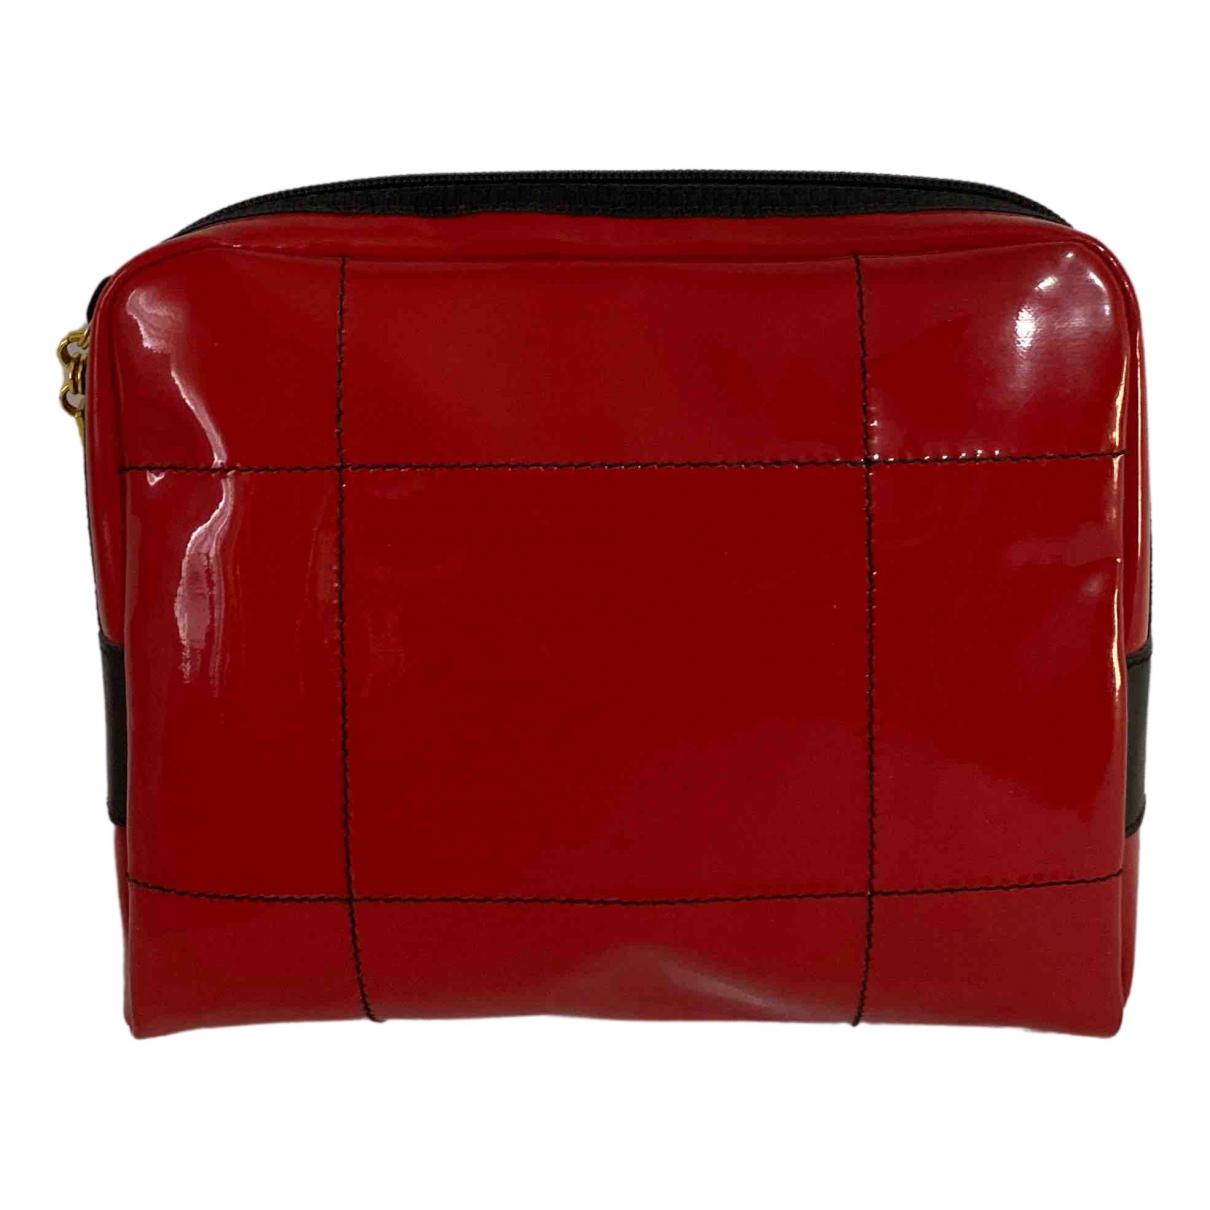 Salvatore Ferragamo \N Red Patent leather Clutch bag for Women \N